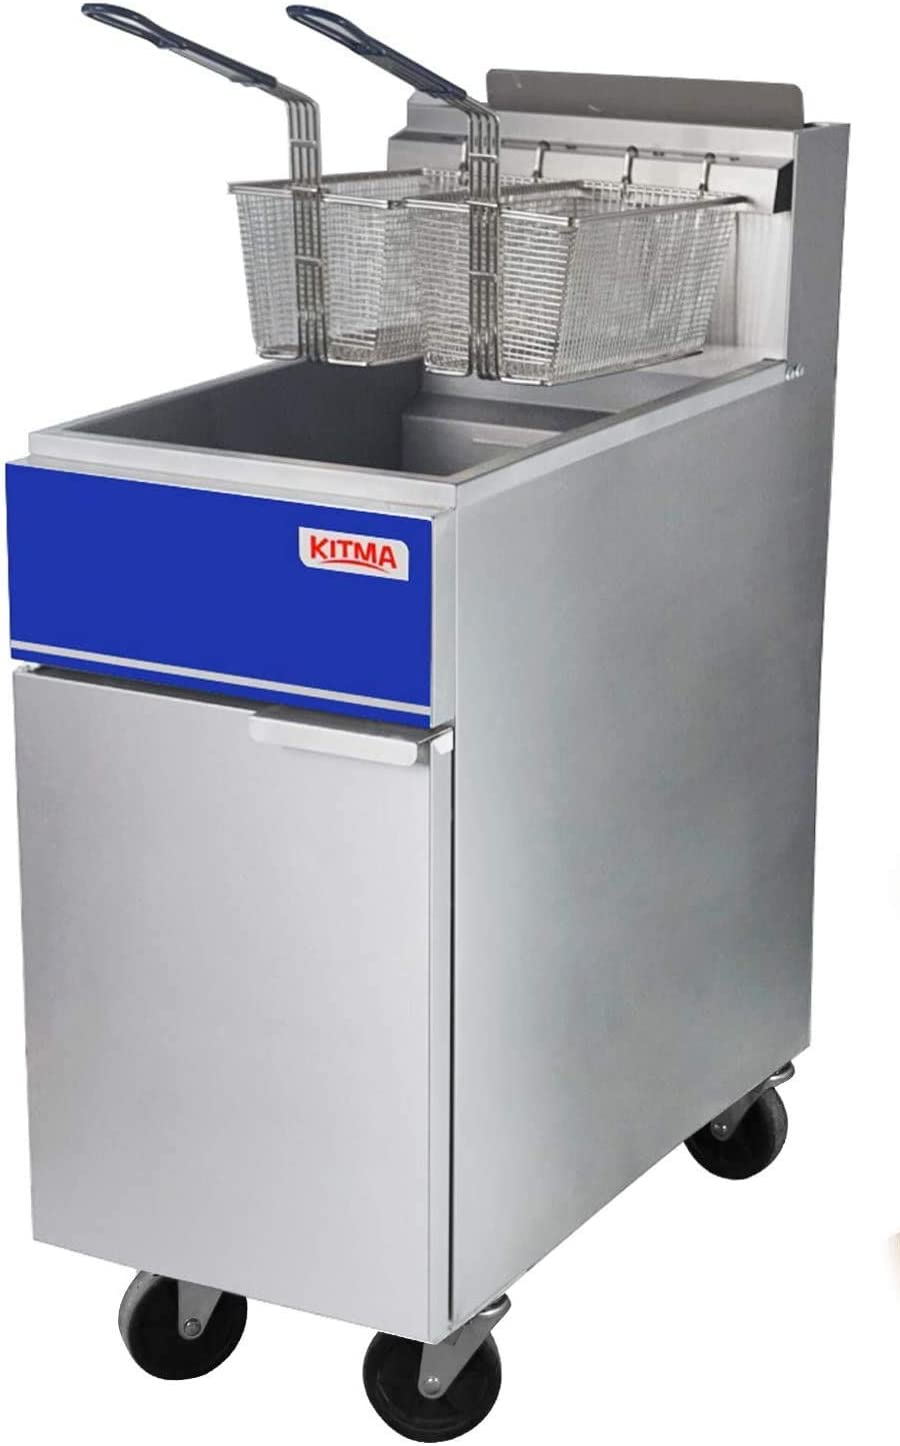 Commercial Deep Fryer, 3 Tube Floor Fryer with 2 Fryer Baskets, 40 lb. Liquid Propane Fryer for Restaurant, Kitchen, 90,000 BTU/h